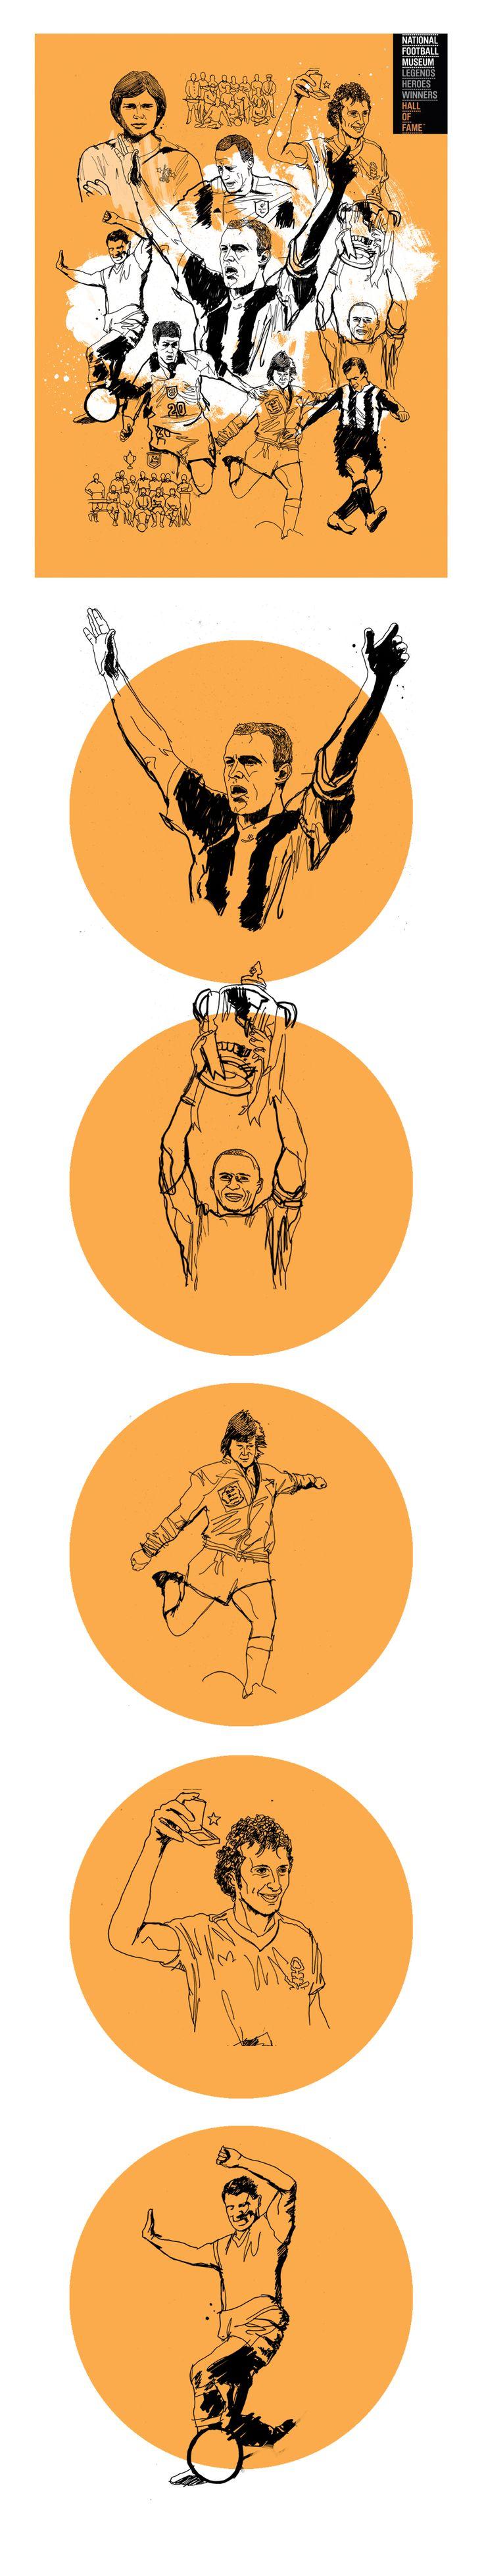 Ben Tallon | Illustrator | Illustration | Typography | Sports Illustrator | Editorial Design |